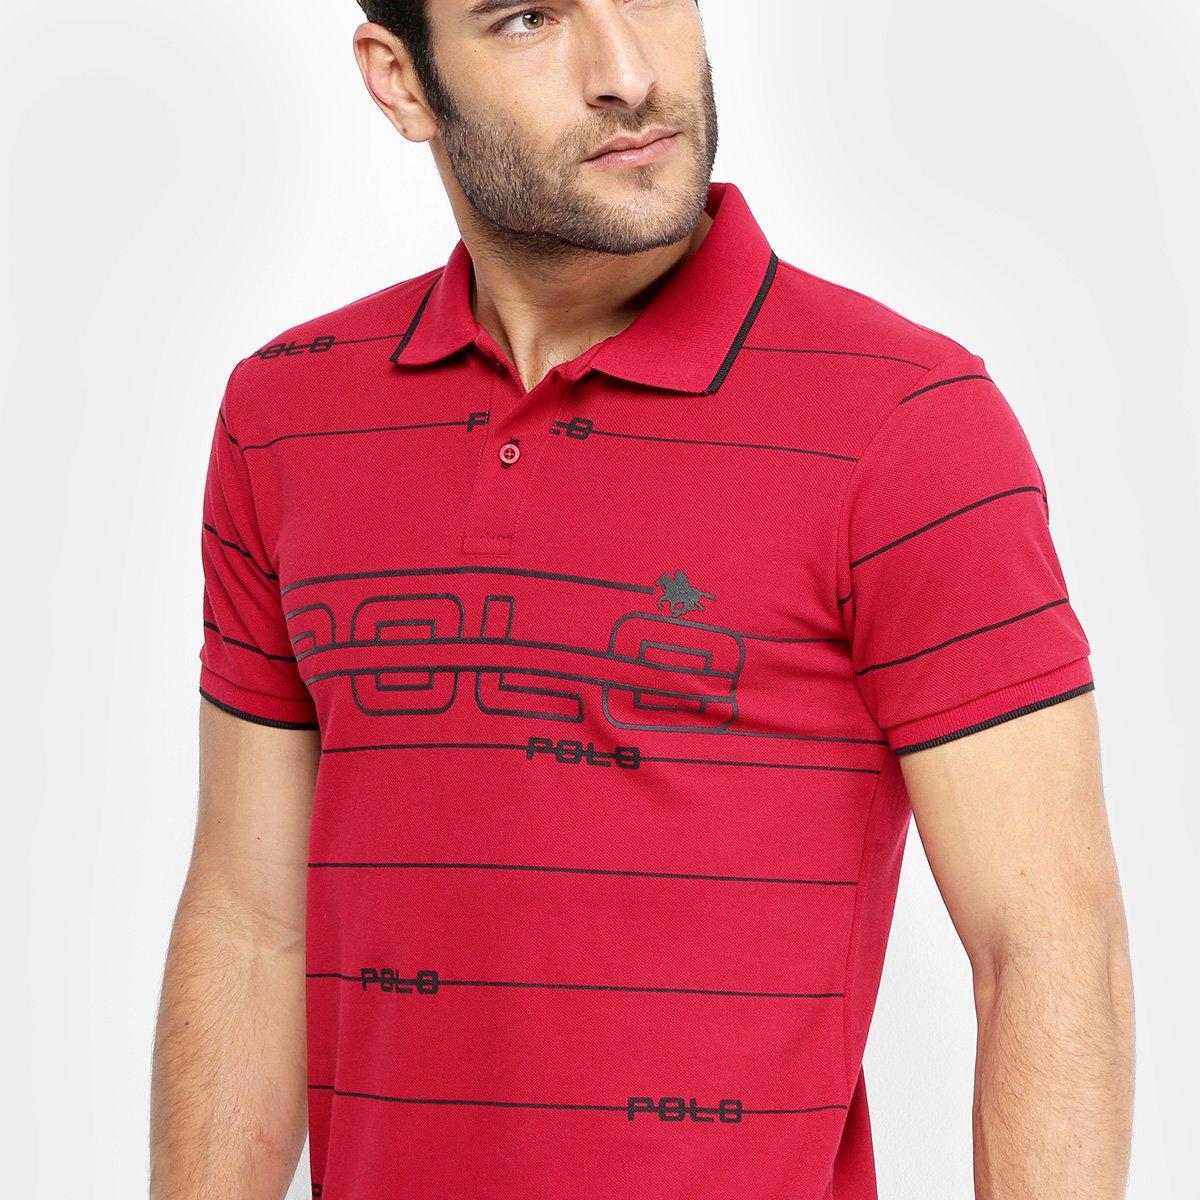 17903513c2 Camisa Polo em Piquet Estampada Polo RG 518 Manga Curta Masculina ...